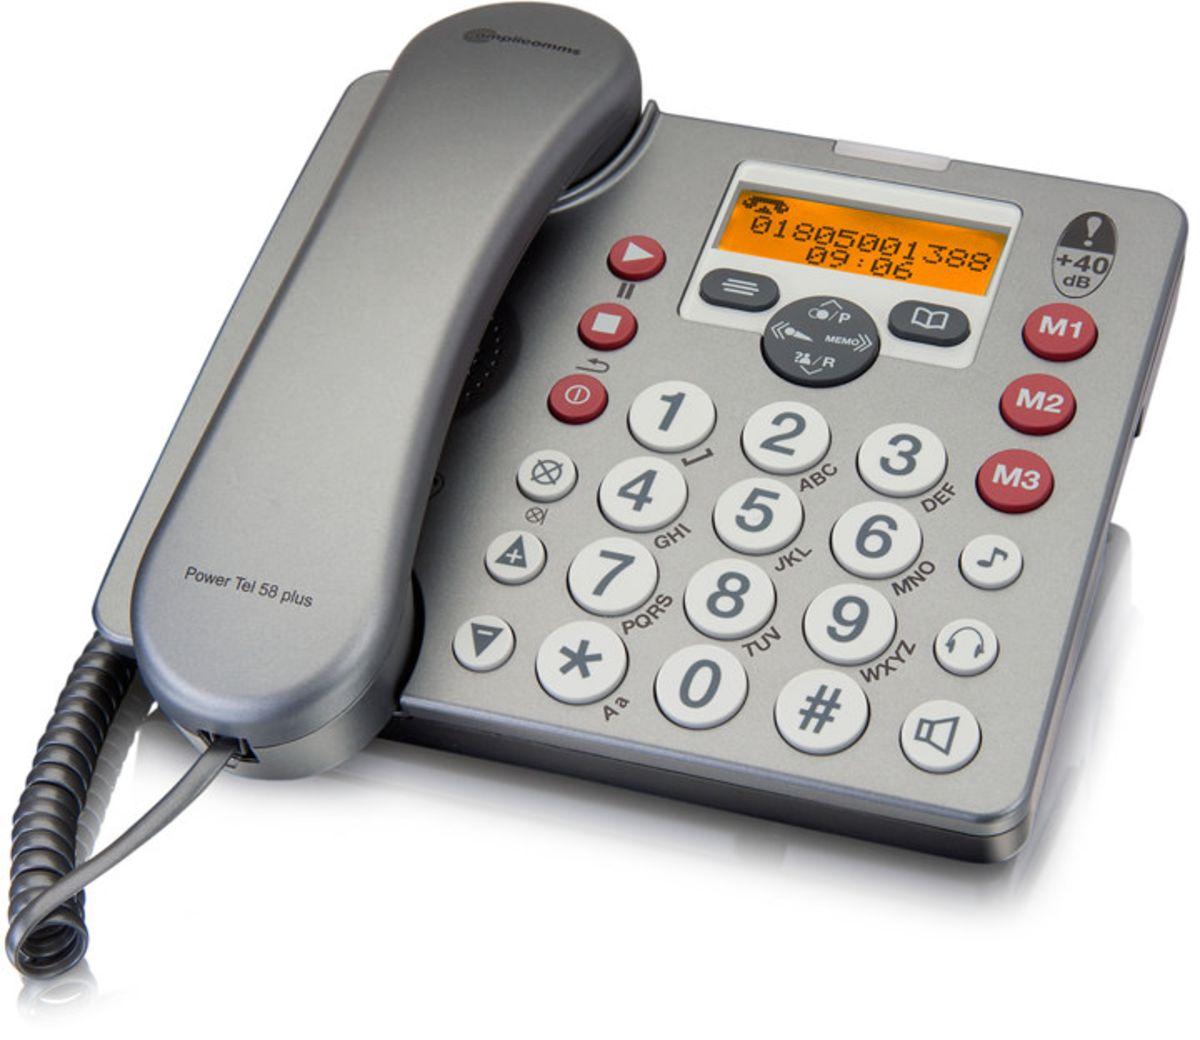 AMPLICOMMS amplicomms Großtastentelefon »PowerTel 58 plus«